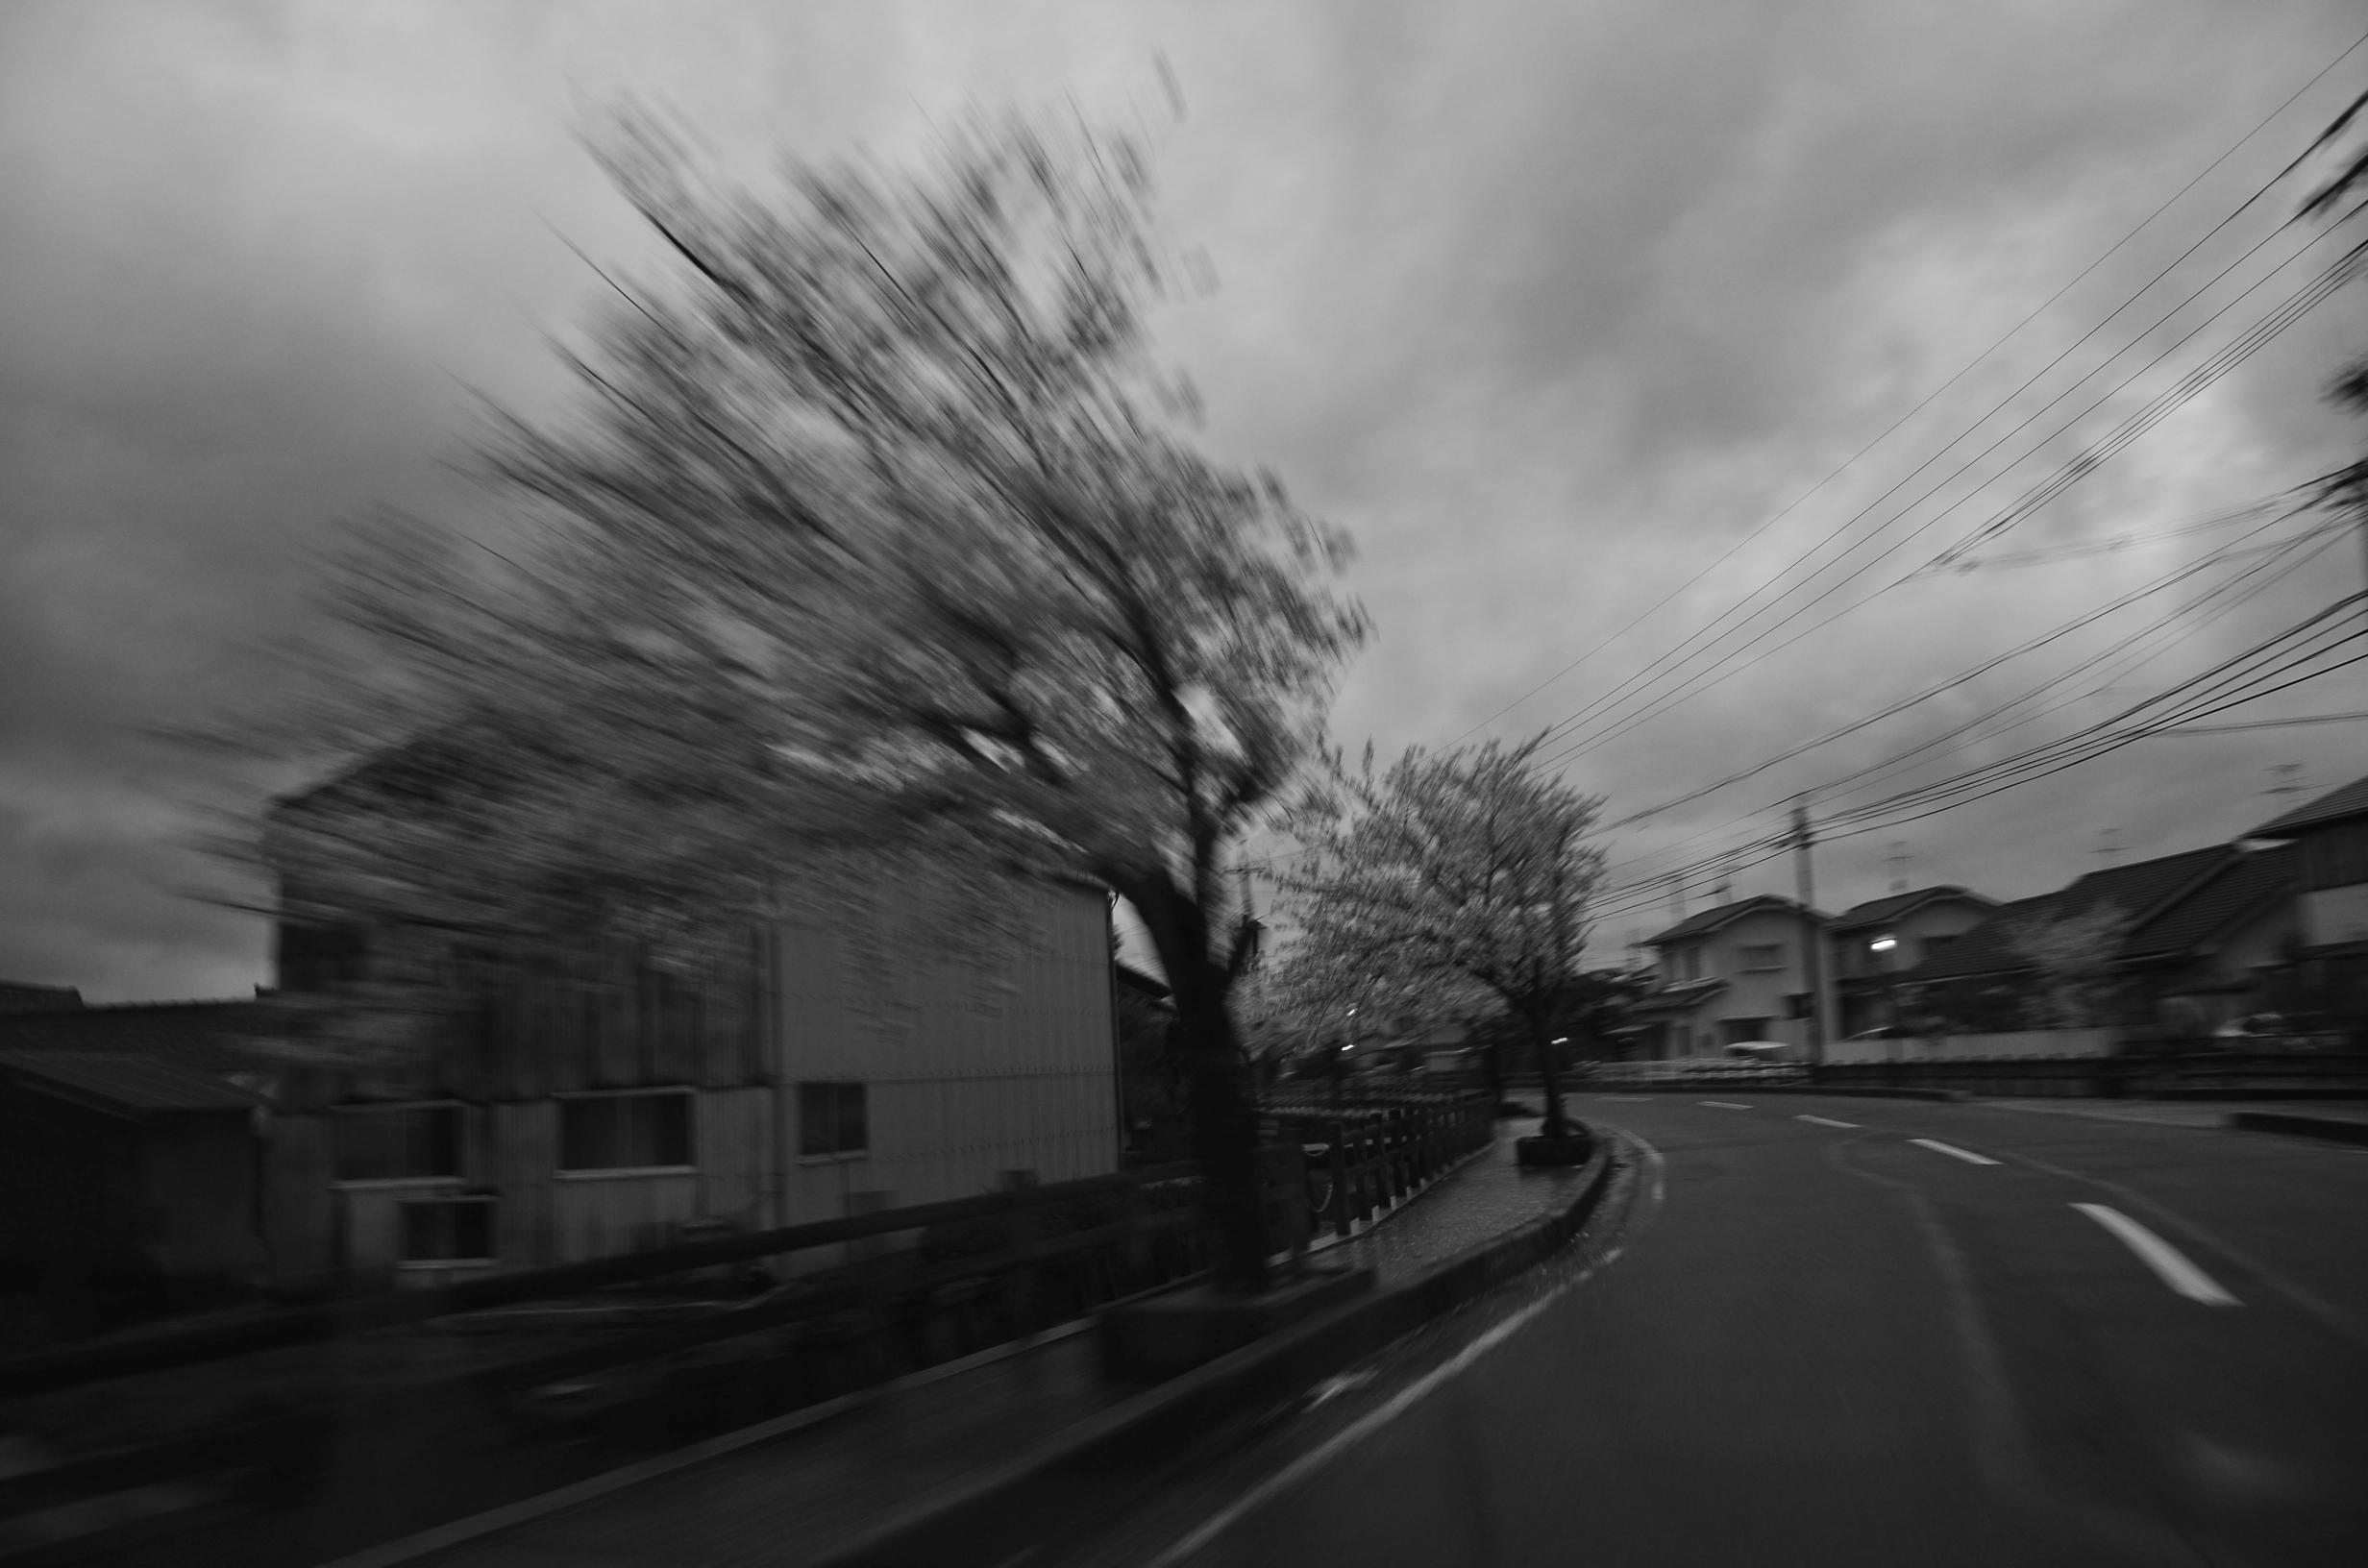 th_DSC_3145.jpg